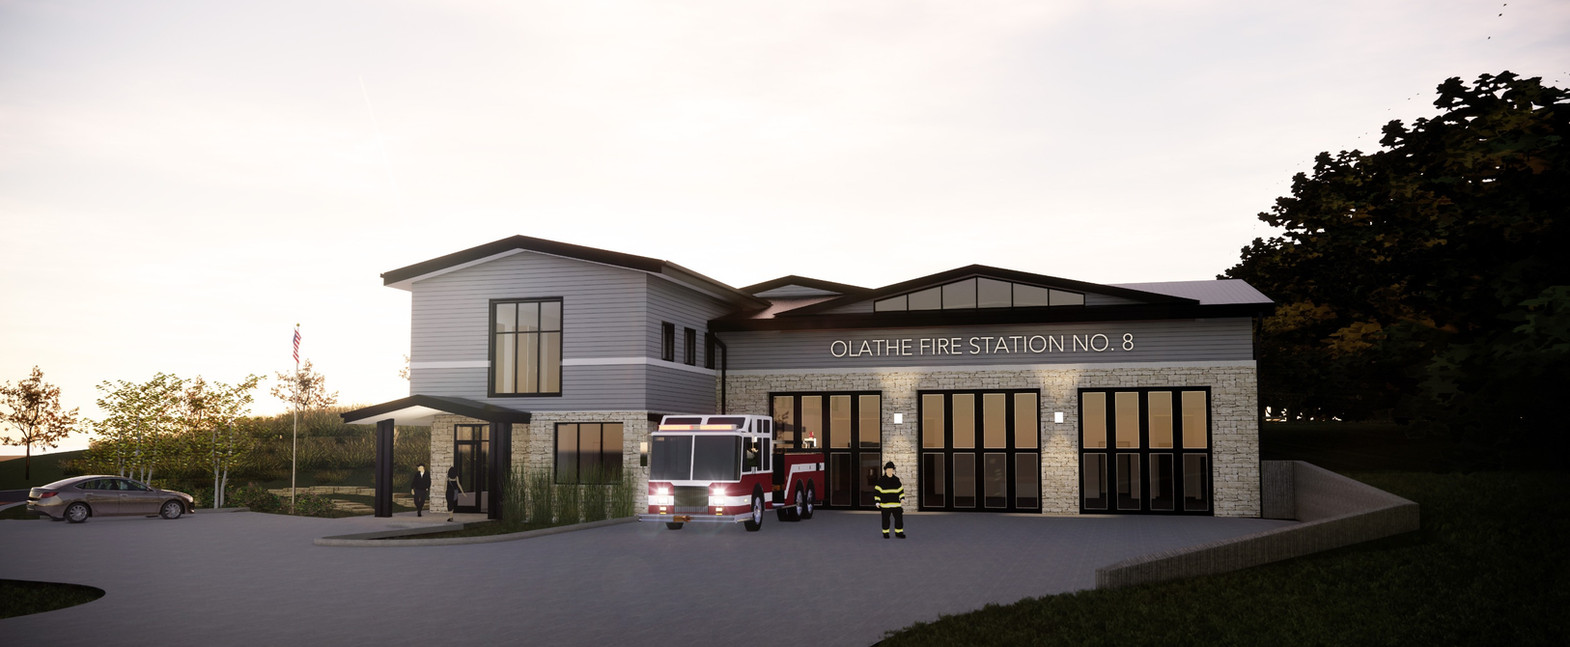 OLATHE FIRE STATION NO.8